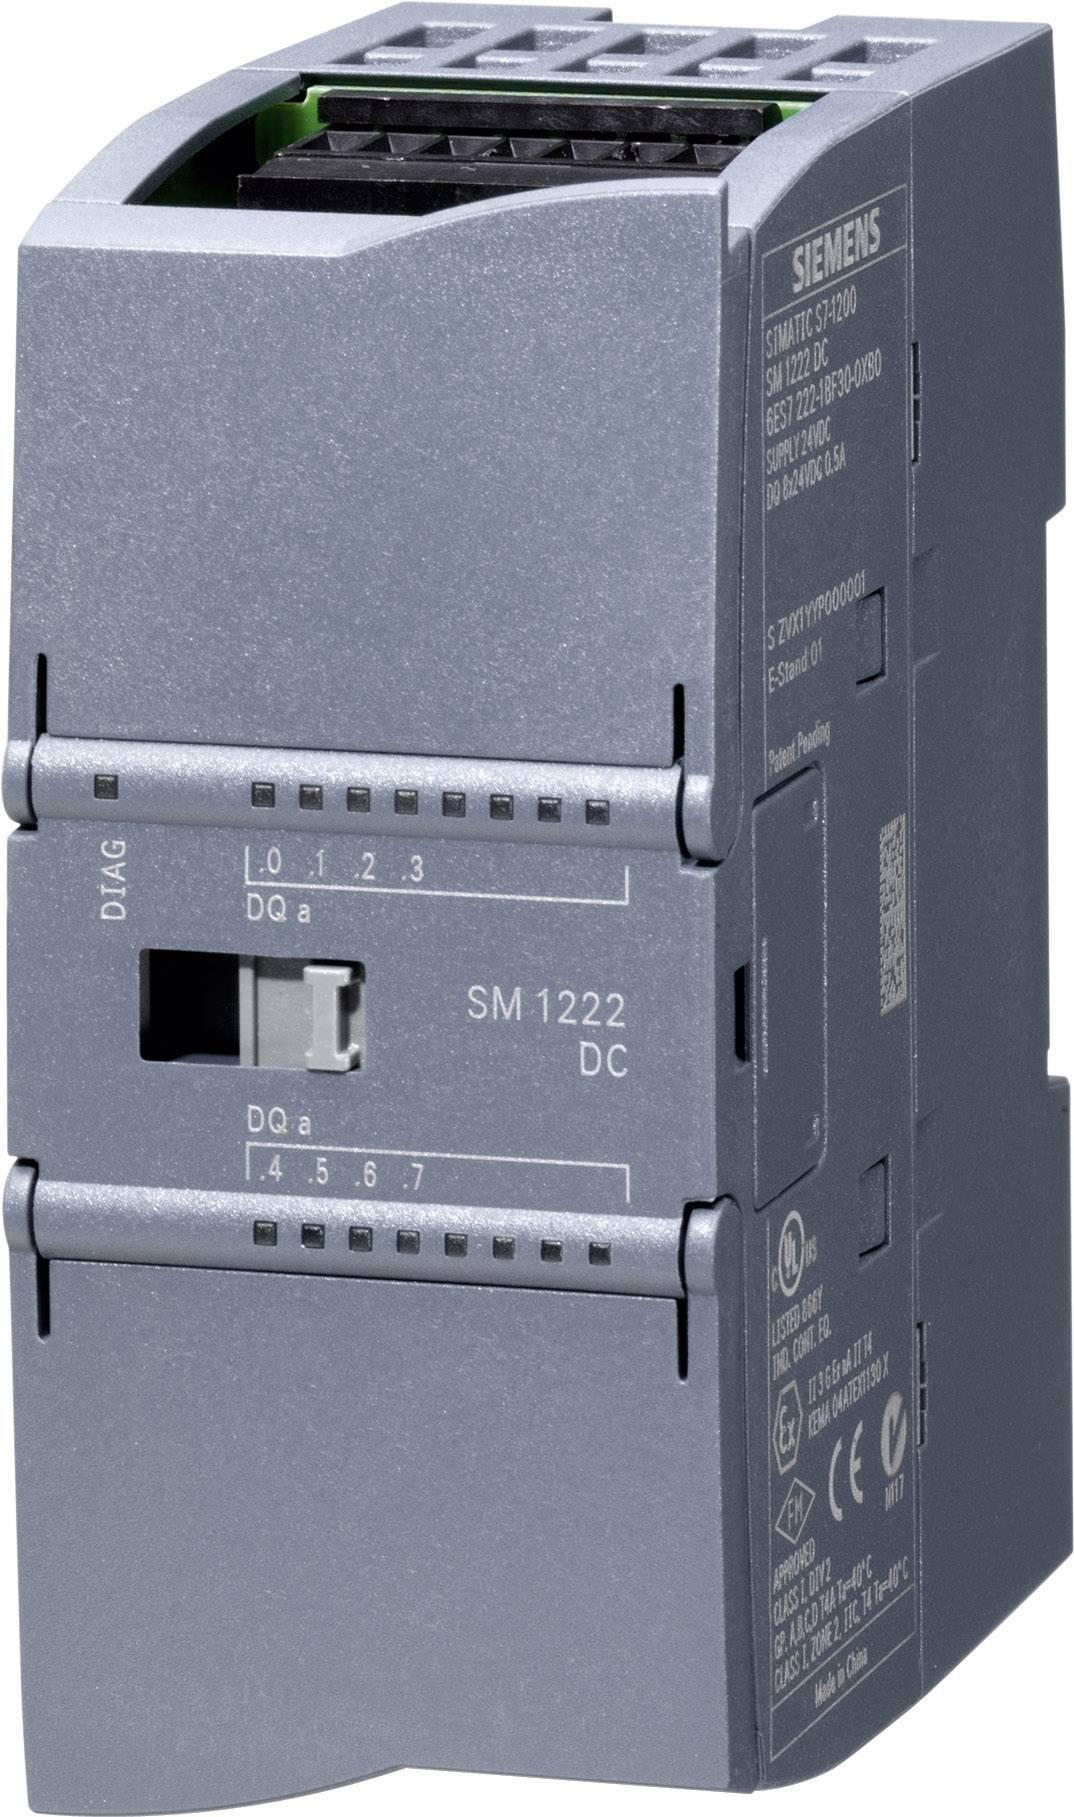 Rozšiřovací PLC modul Siemens SM 1222 (6ES7222-1BH32-0XB0)